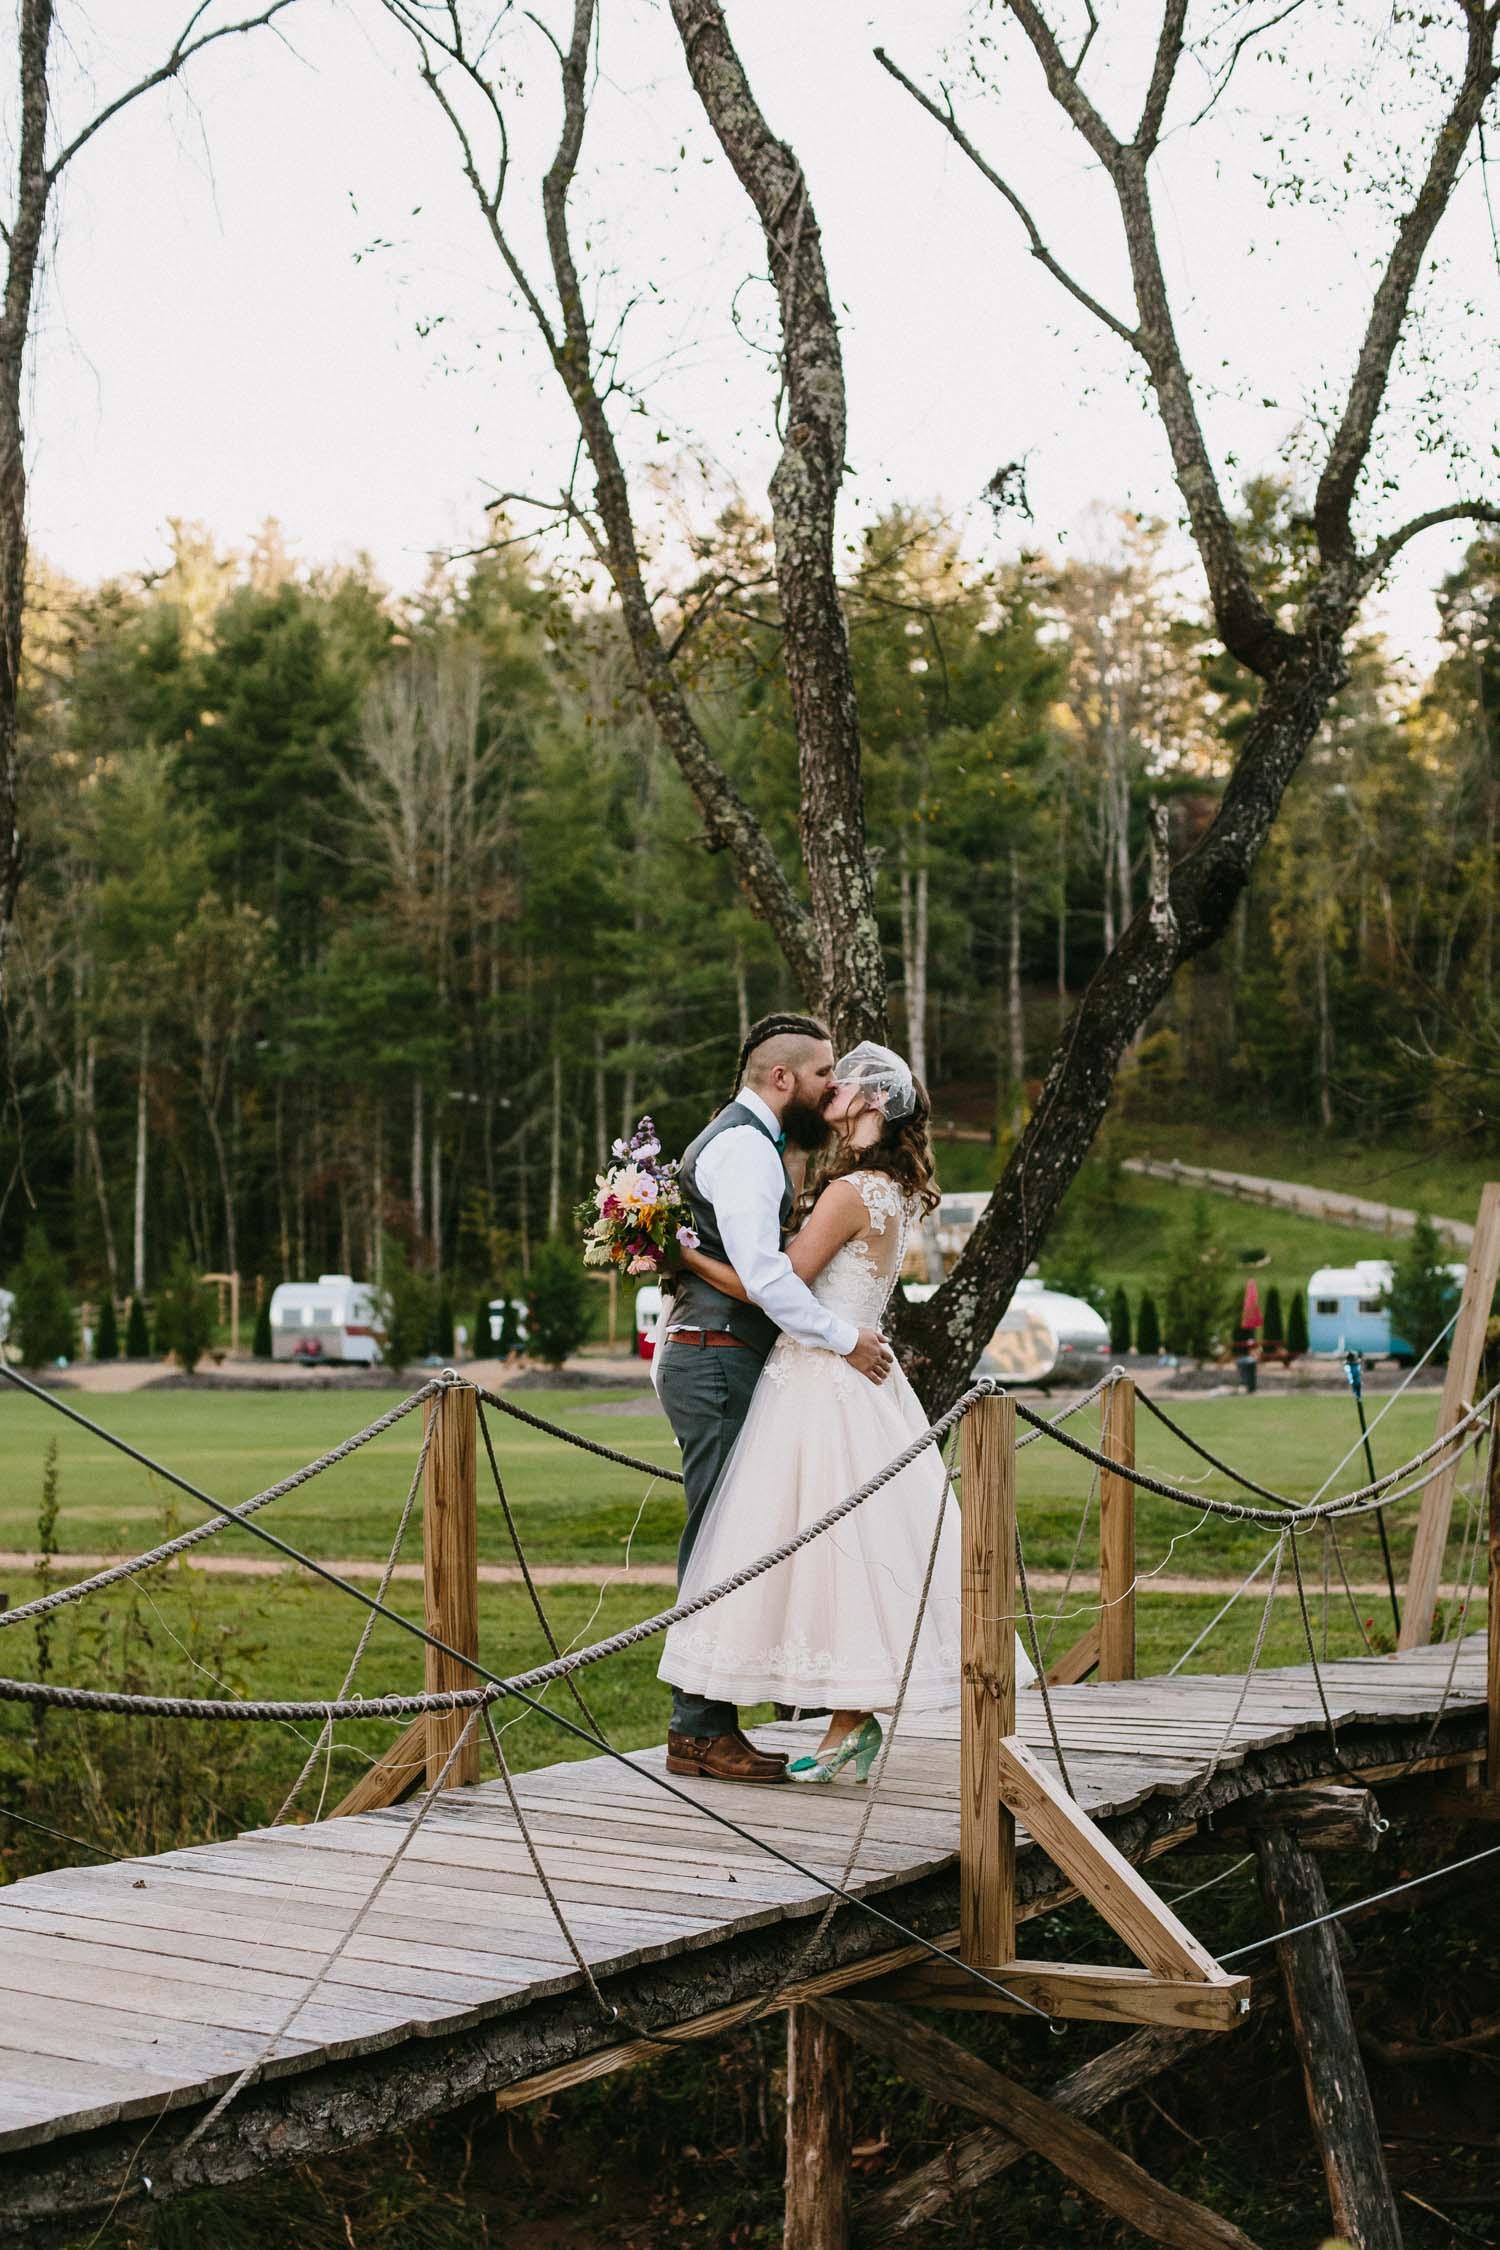 Angeli_Joe__Asheville_Wedding-74.jpg